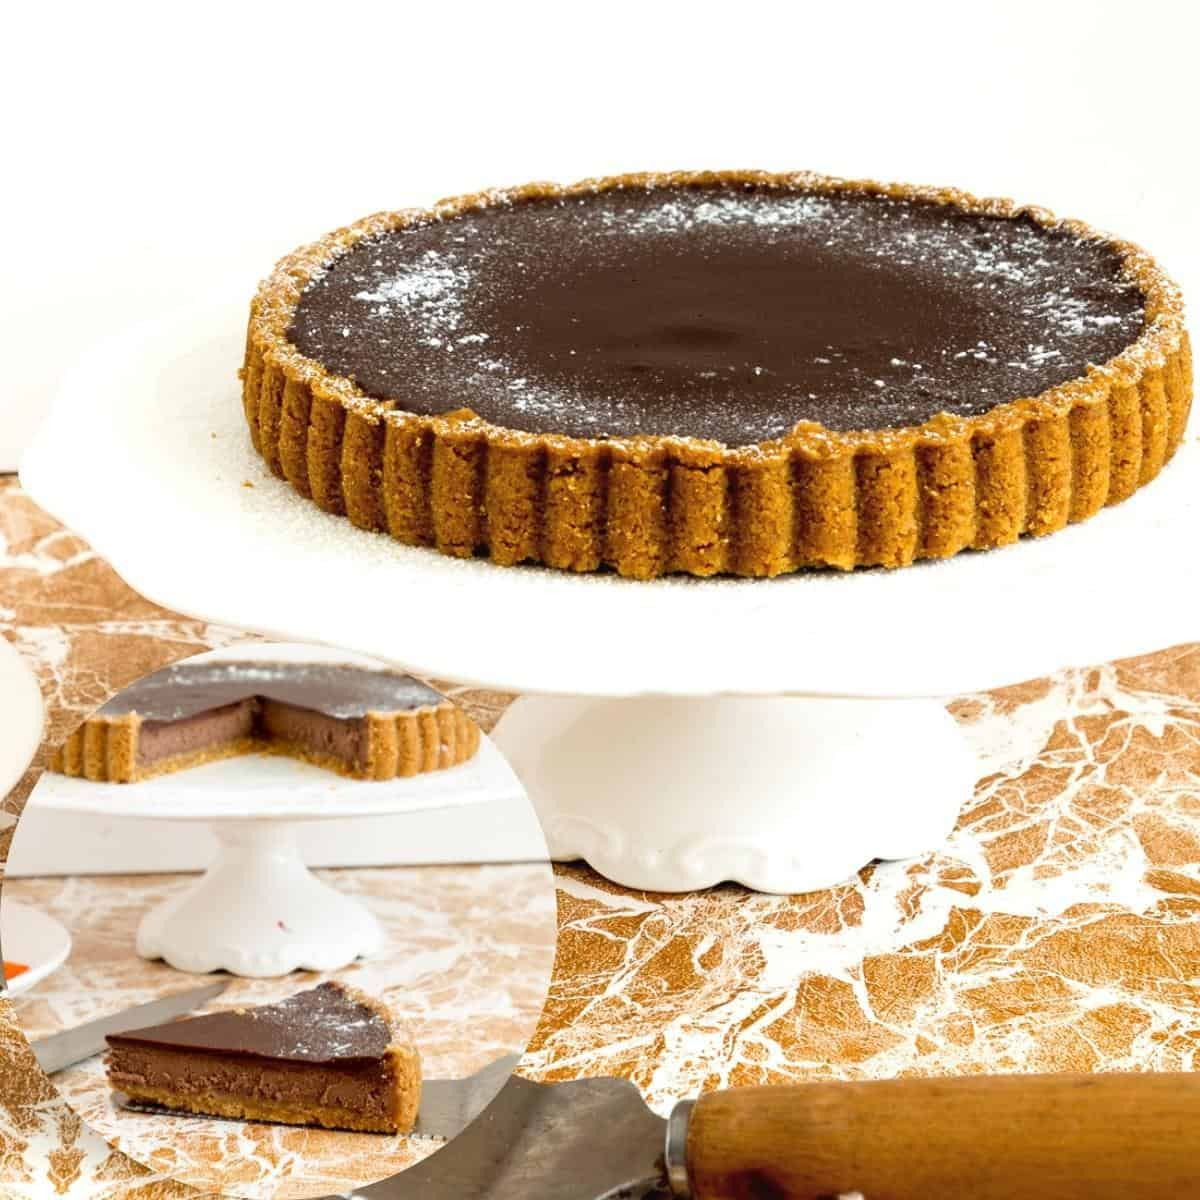 A cheesecake tart with chocolate.